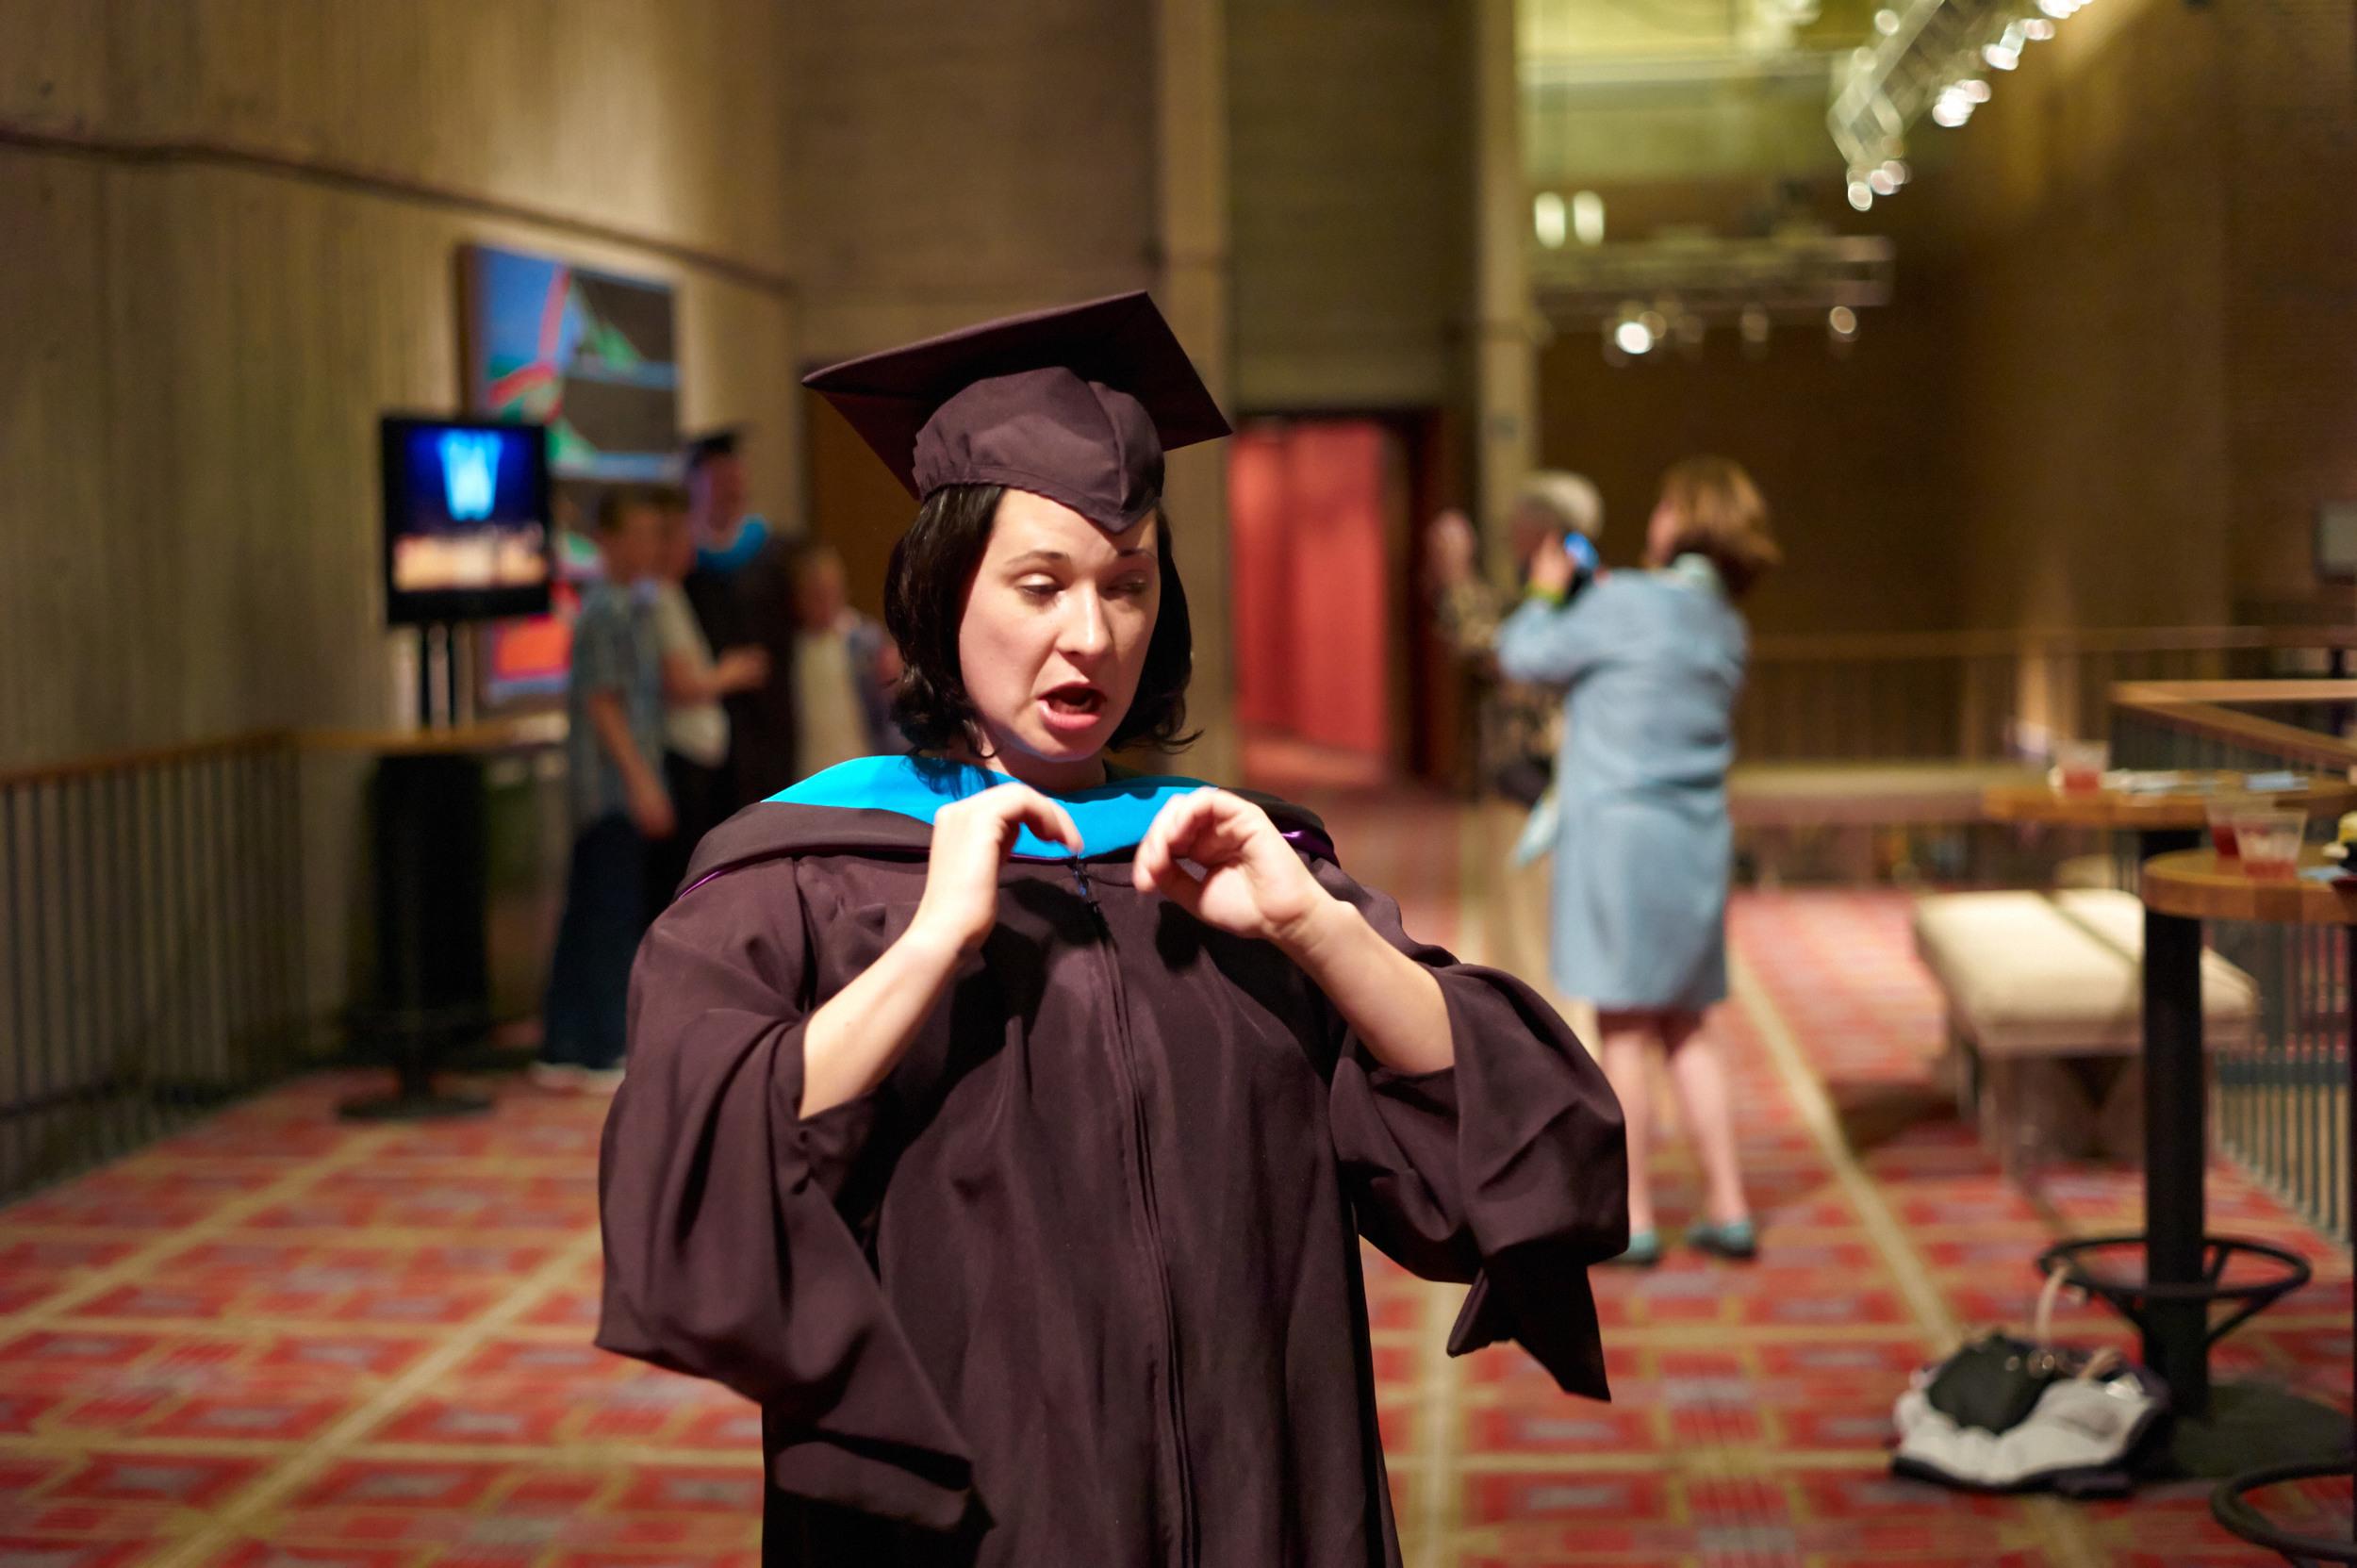 20140612_m9_EvansSchool_Graduation_018_Color.jpg